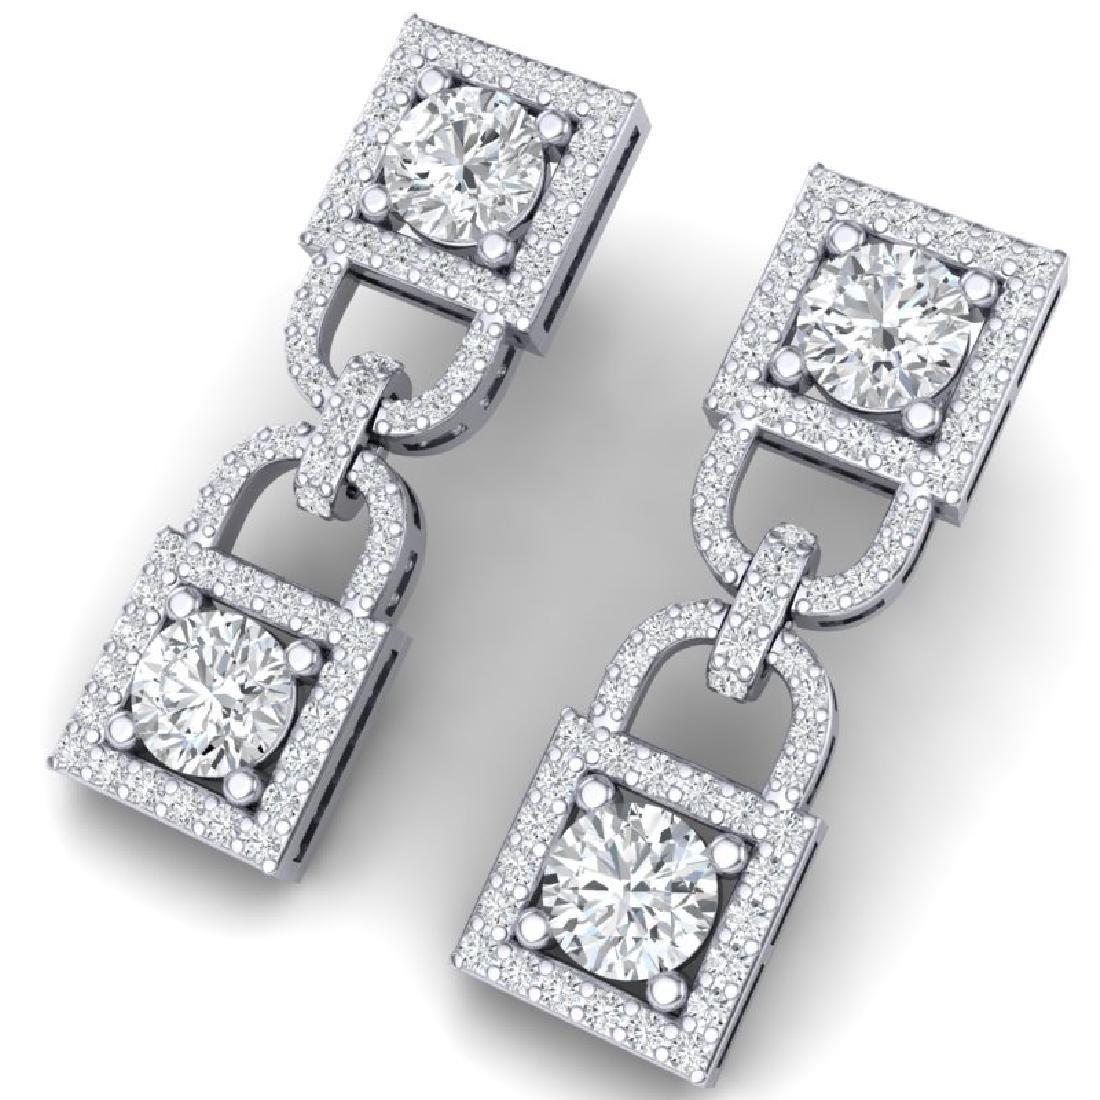 4 CTW Certified SI/I Diamond Halo Earrings 18K White